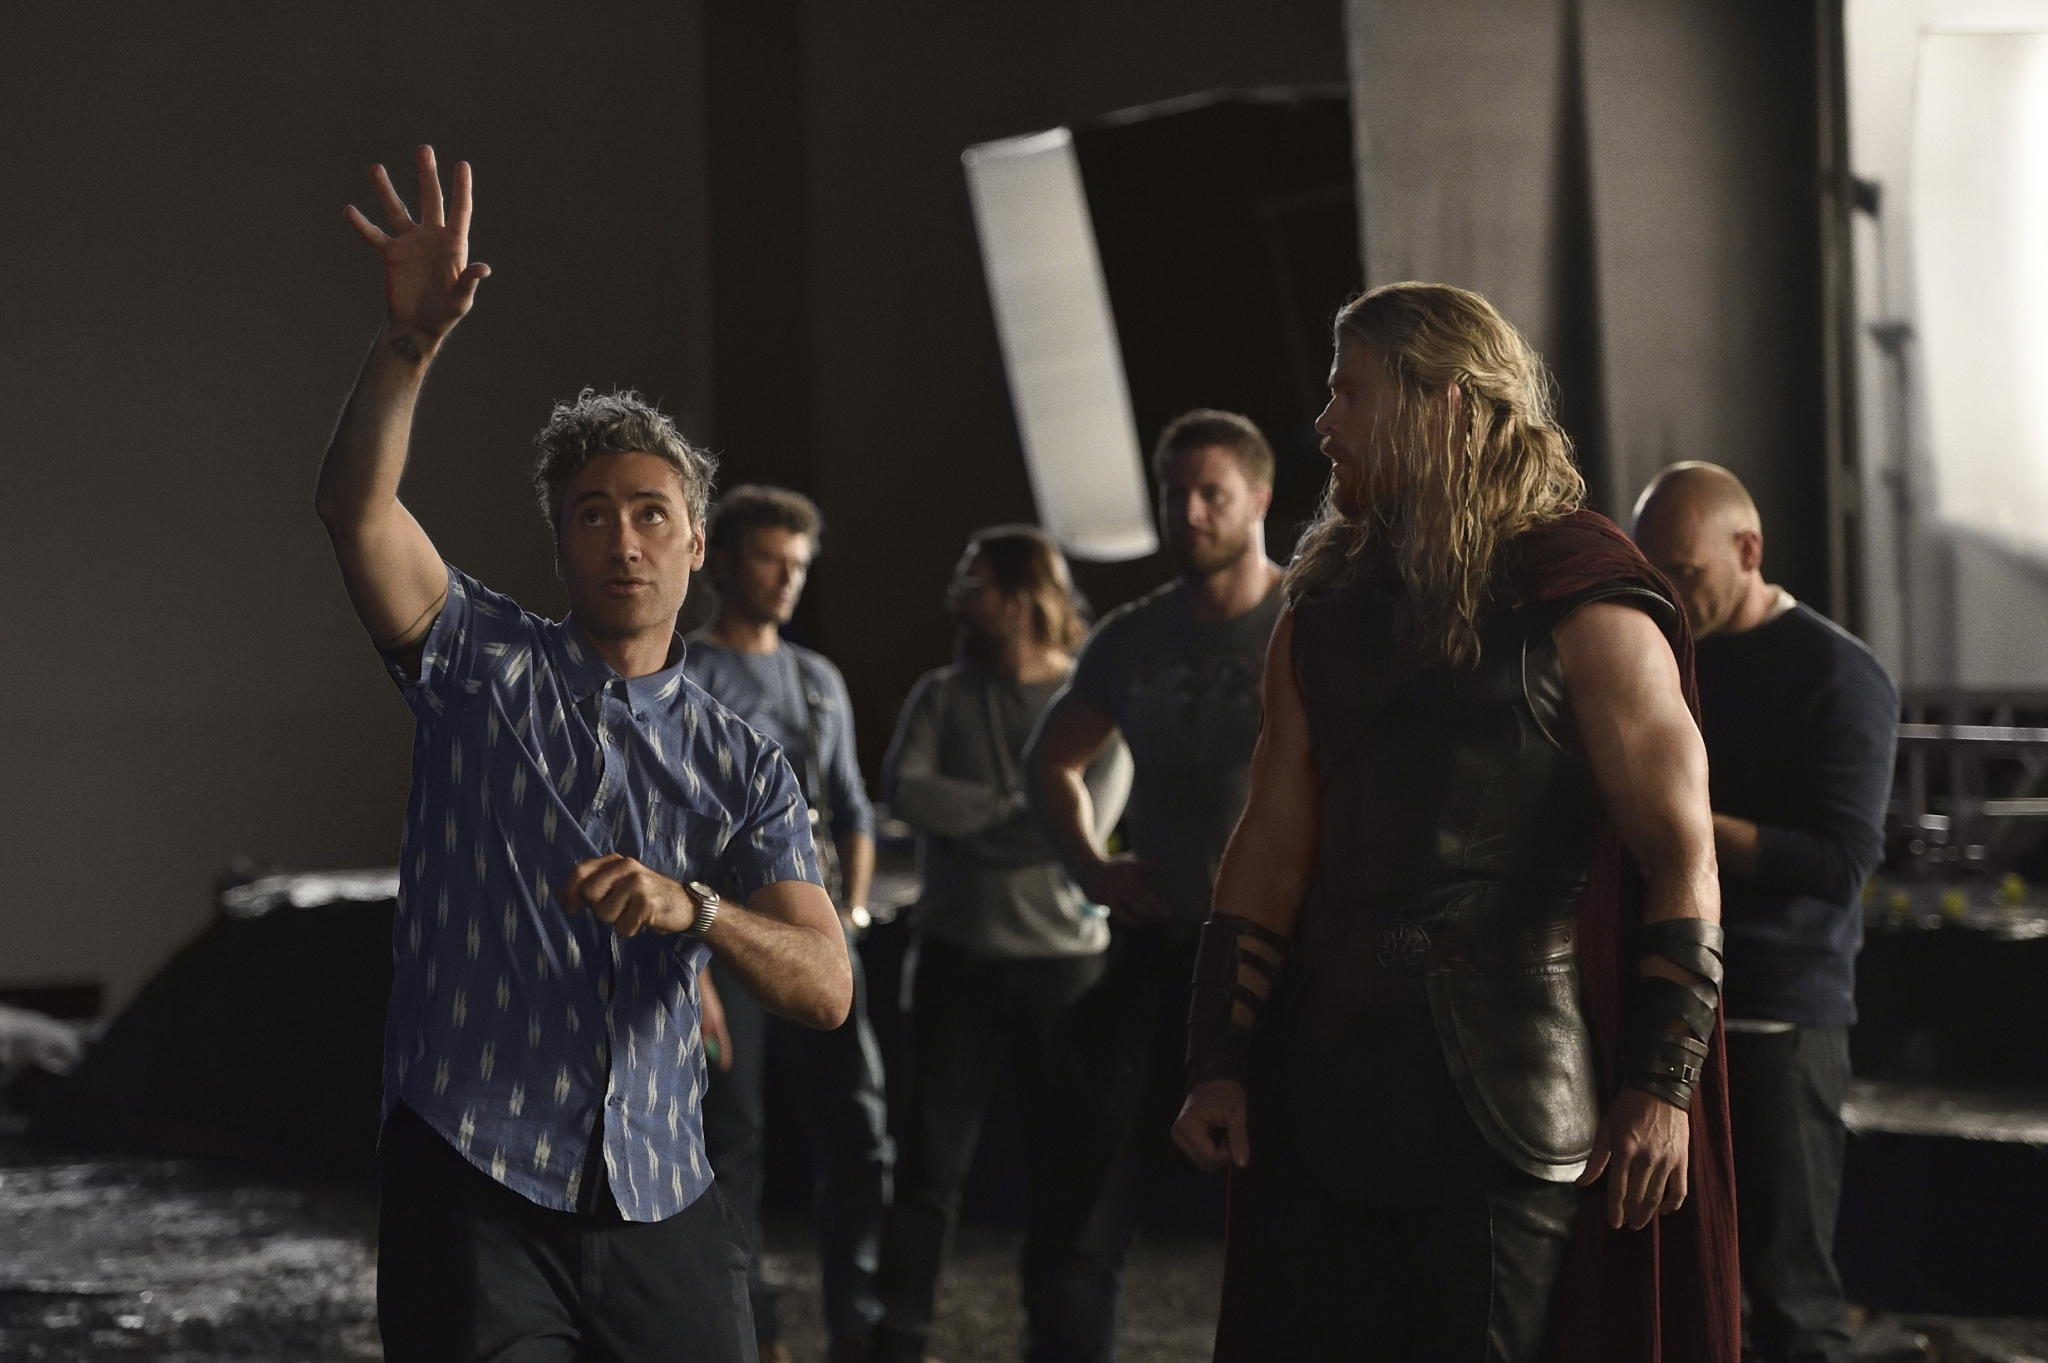 Thor: Ragnarok Behind The Scenes Image